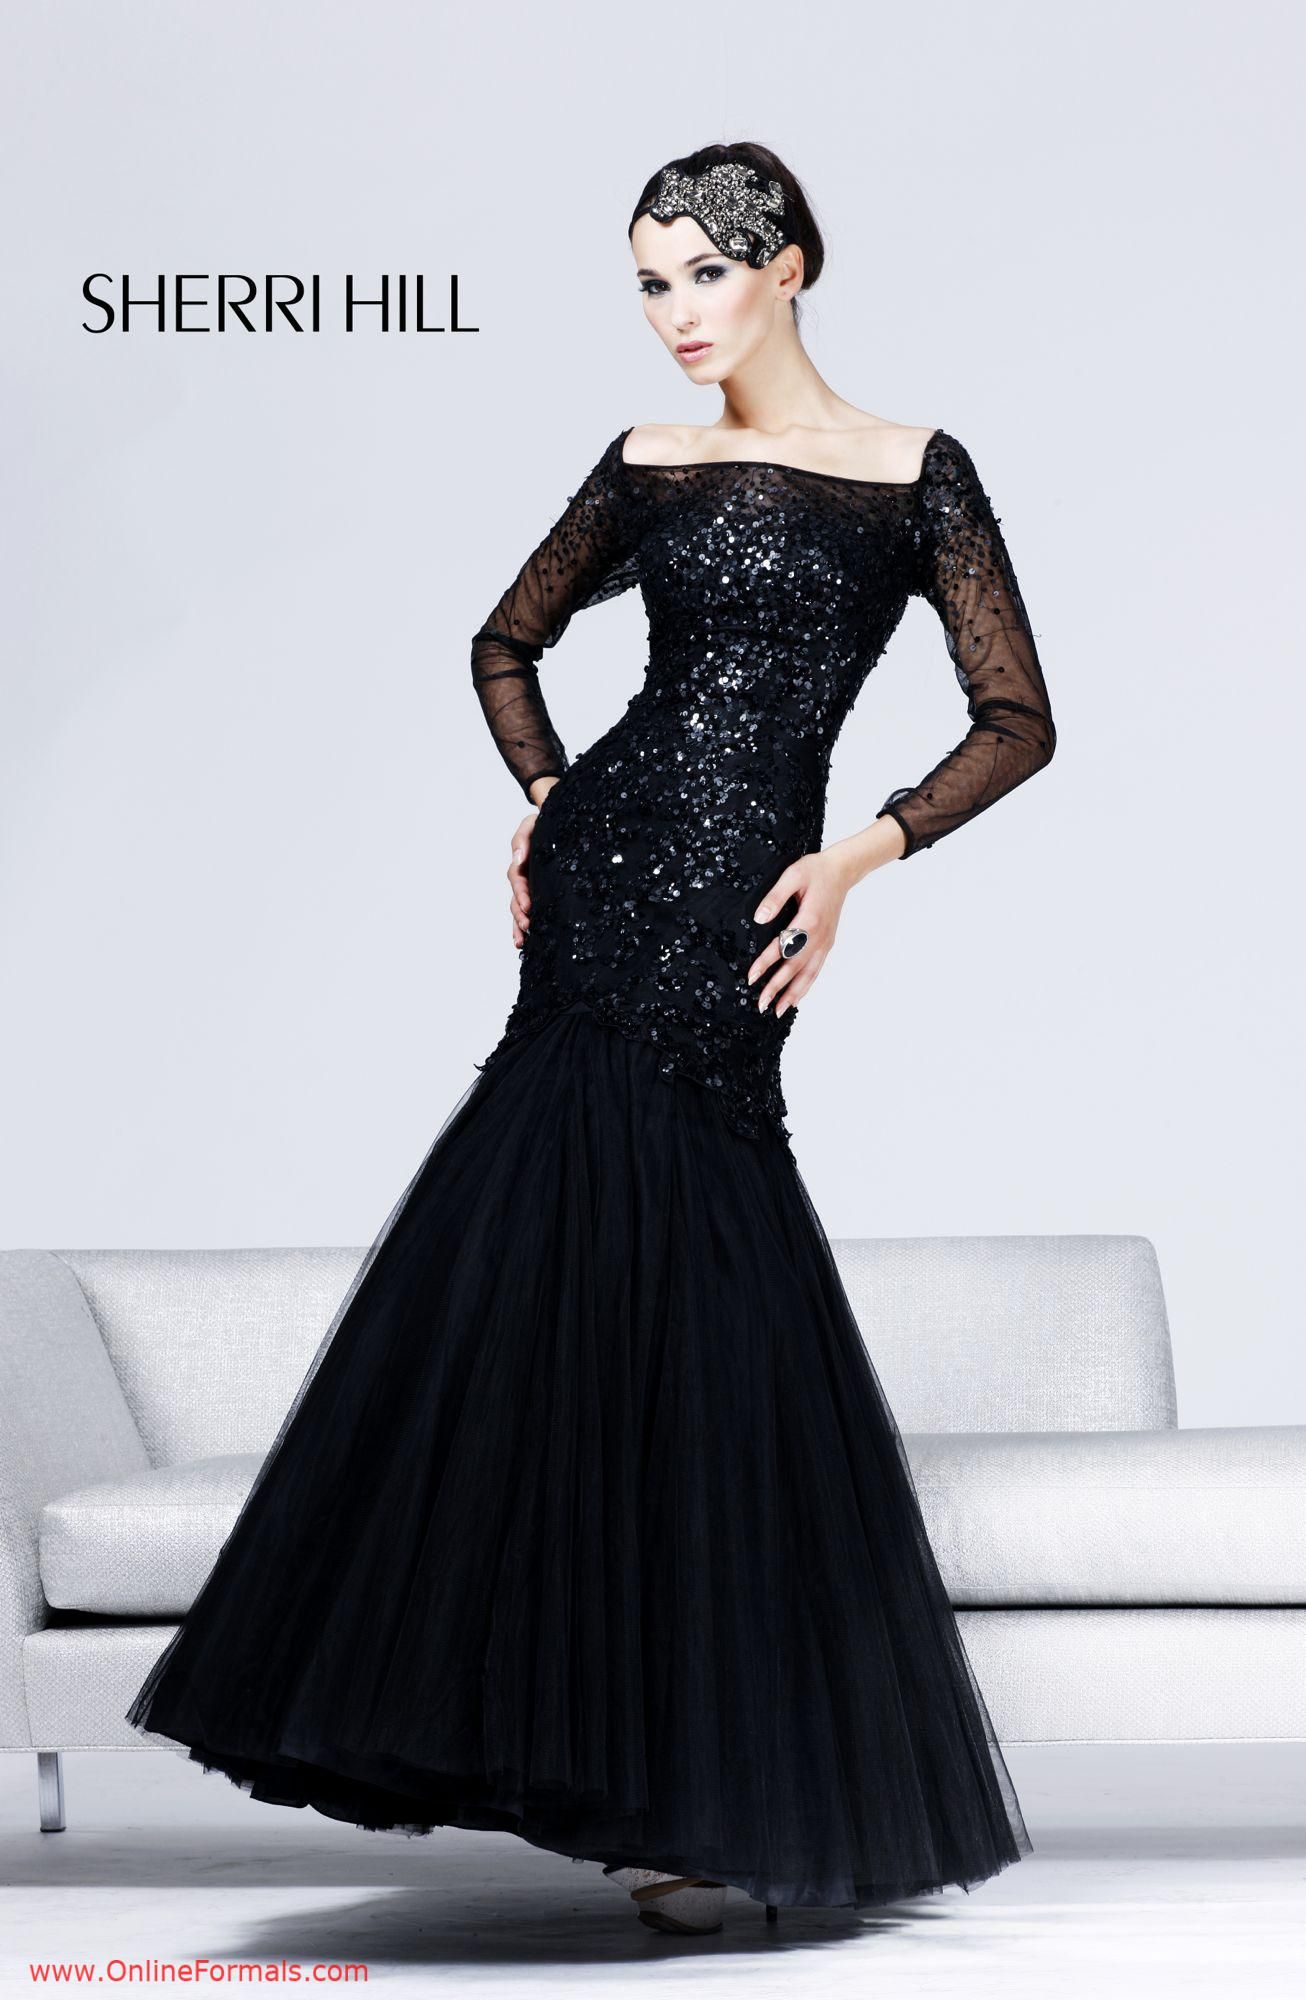 Sherri hill long sleeve prom dress a black tie affair